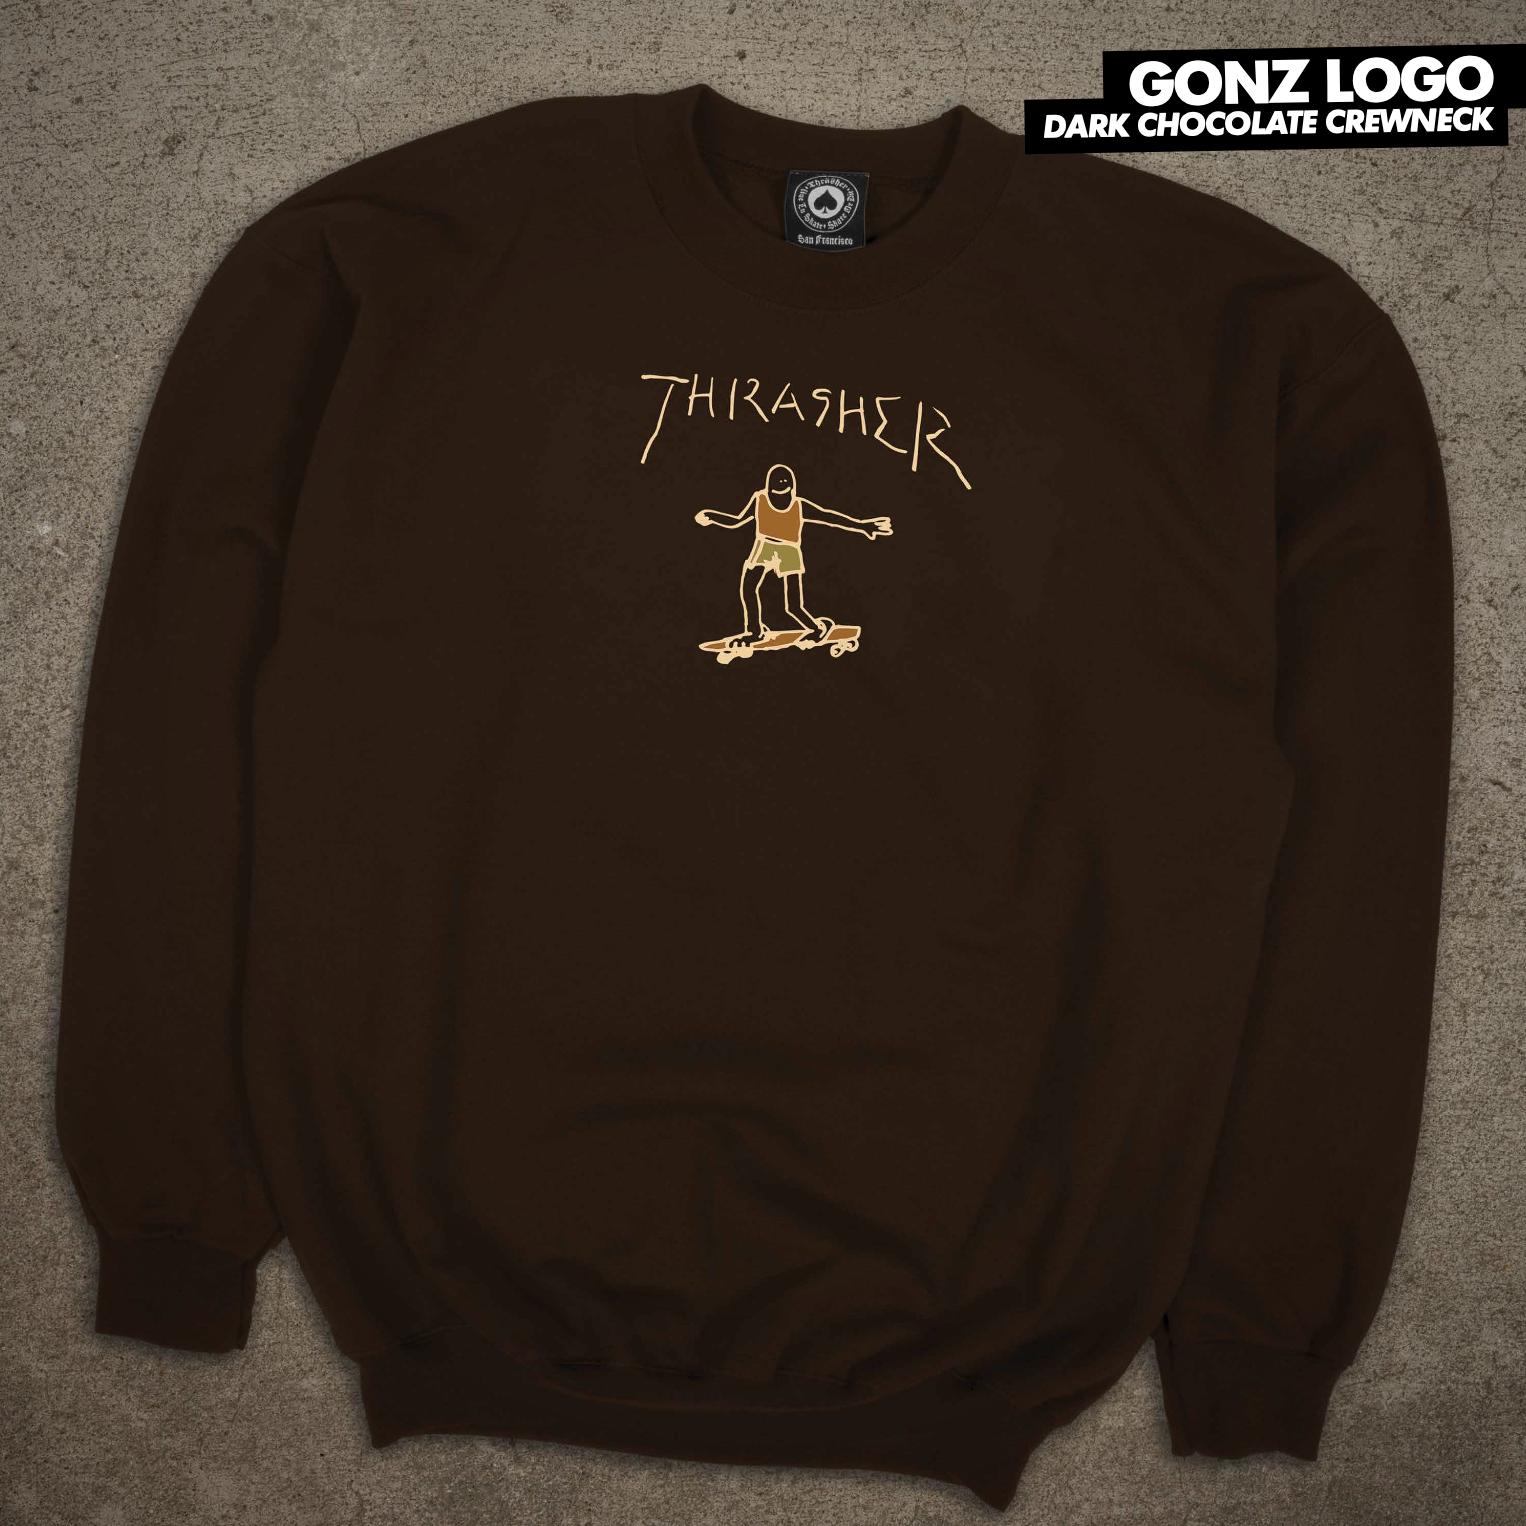 Thrasher Mag. Gonz Logo Hood Dark Chocolate